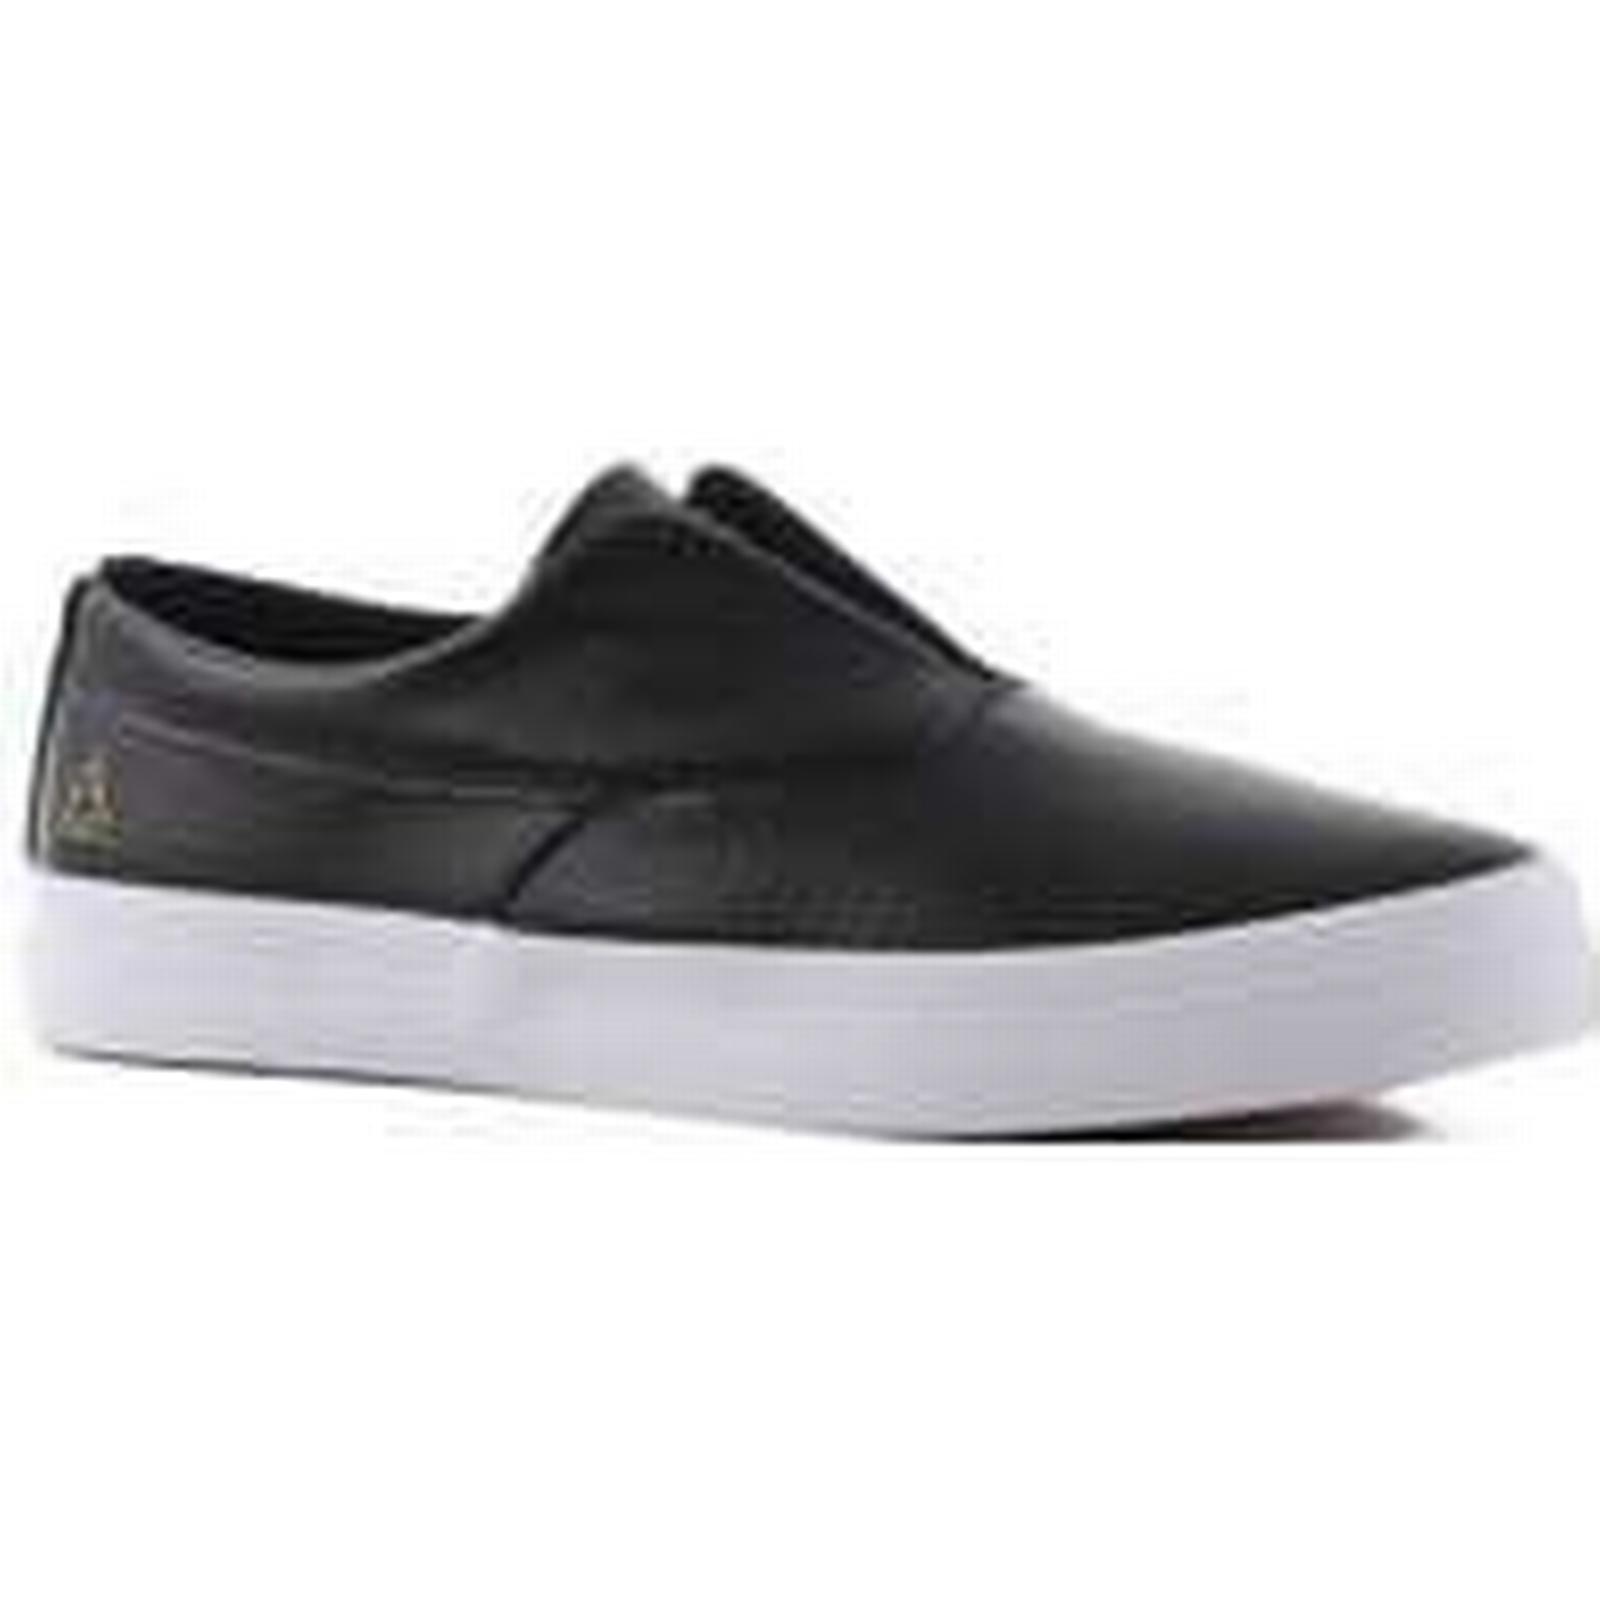 HUF HUF HUF Dylan Slip-On Shoes black c33cca